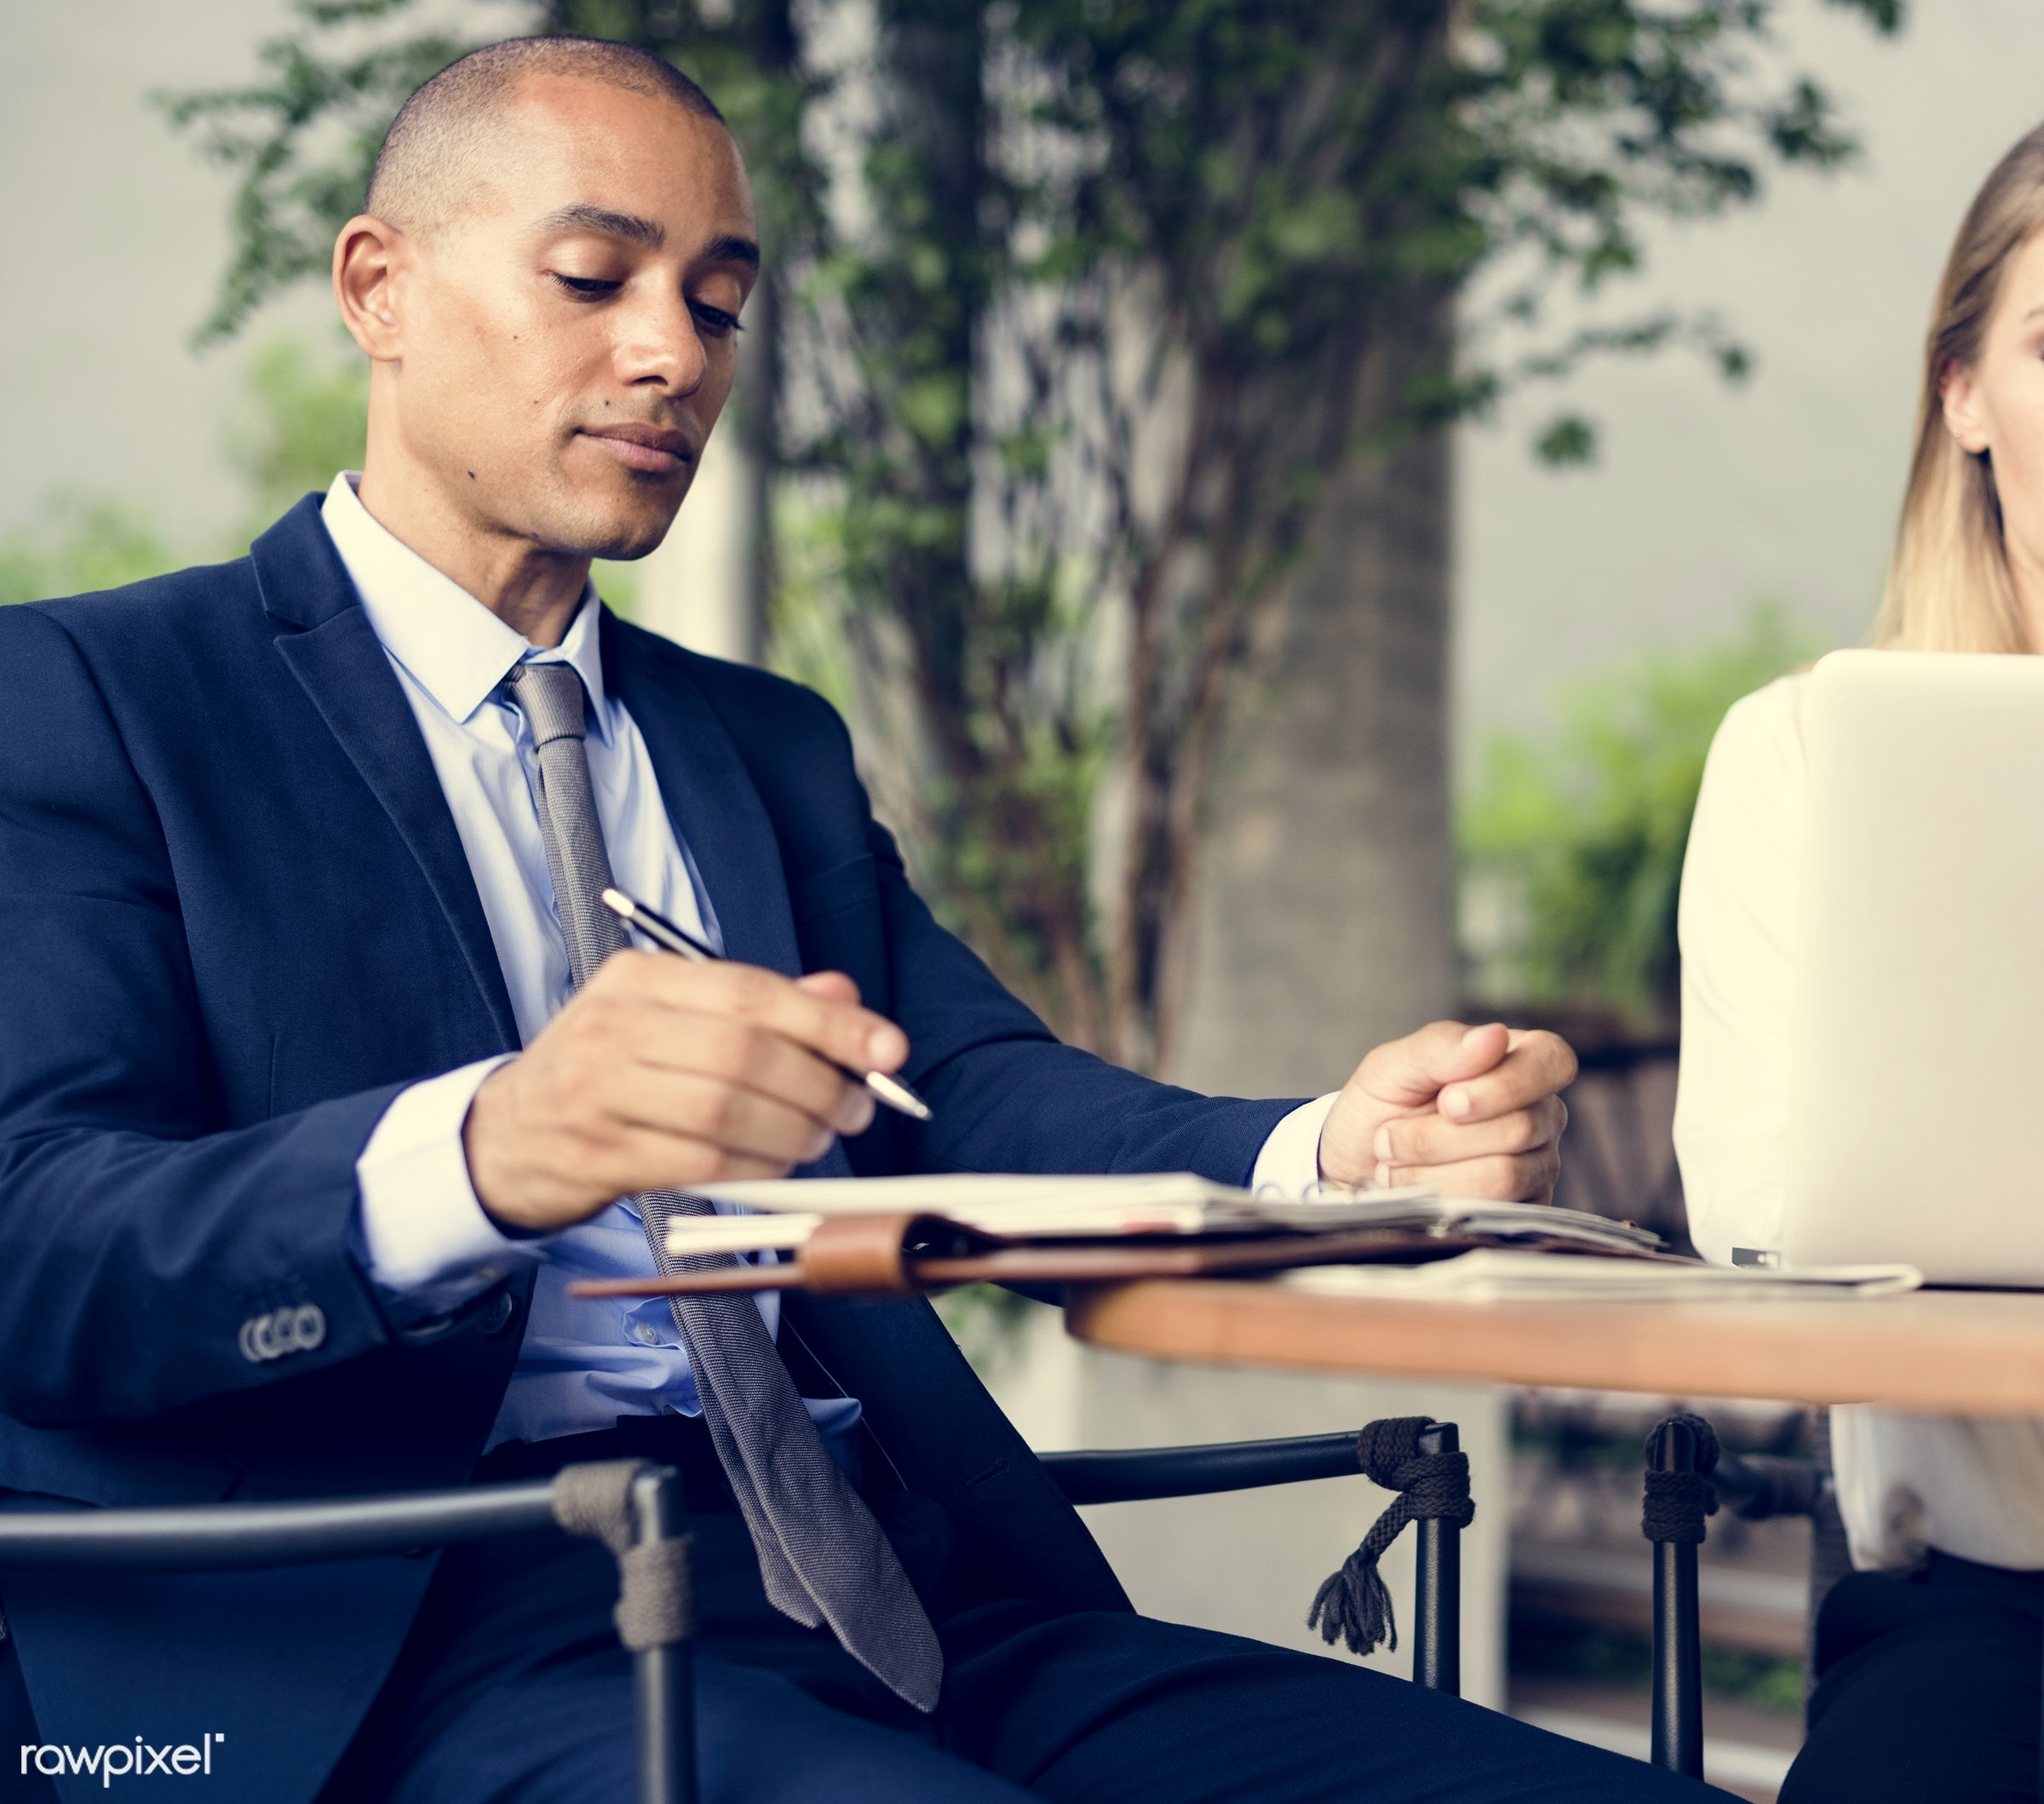 person, collaboration, tie, white collar worker, people, business, teamwork, hands, businesswomen, woman, laptop,...